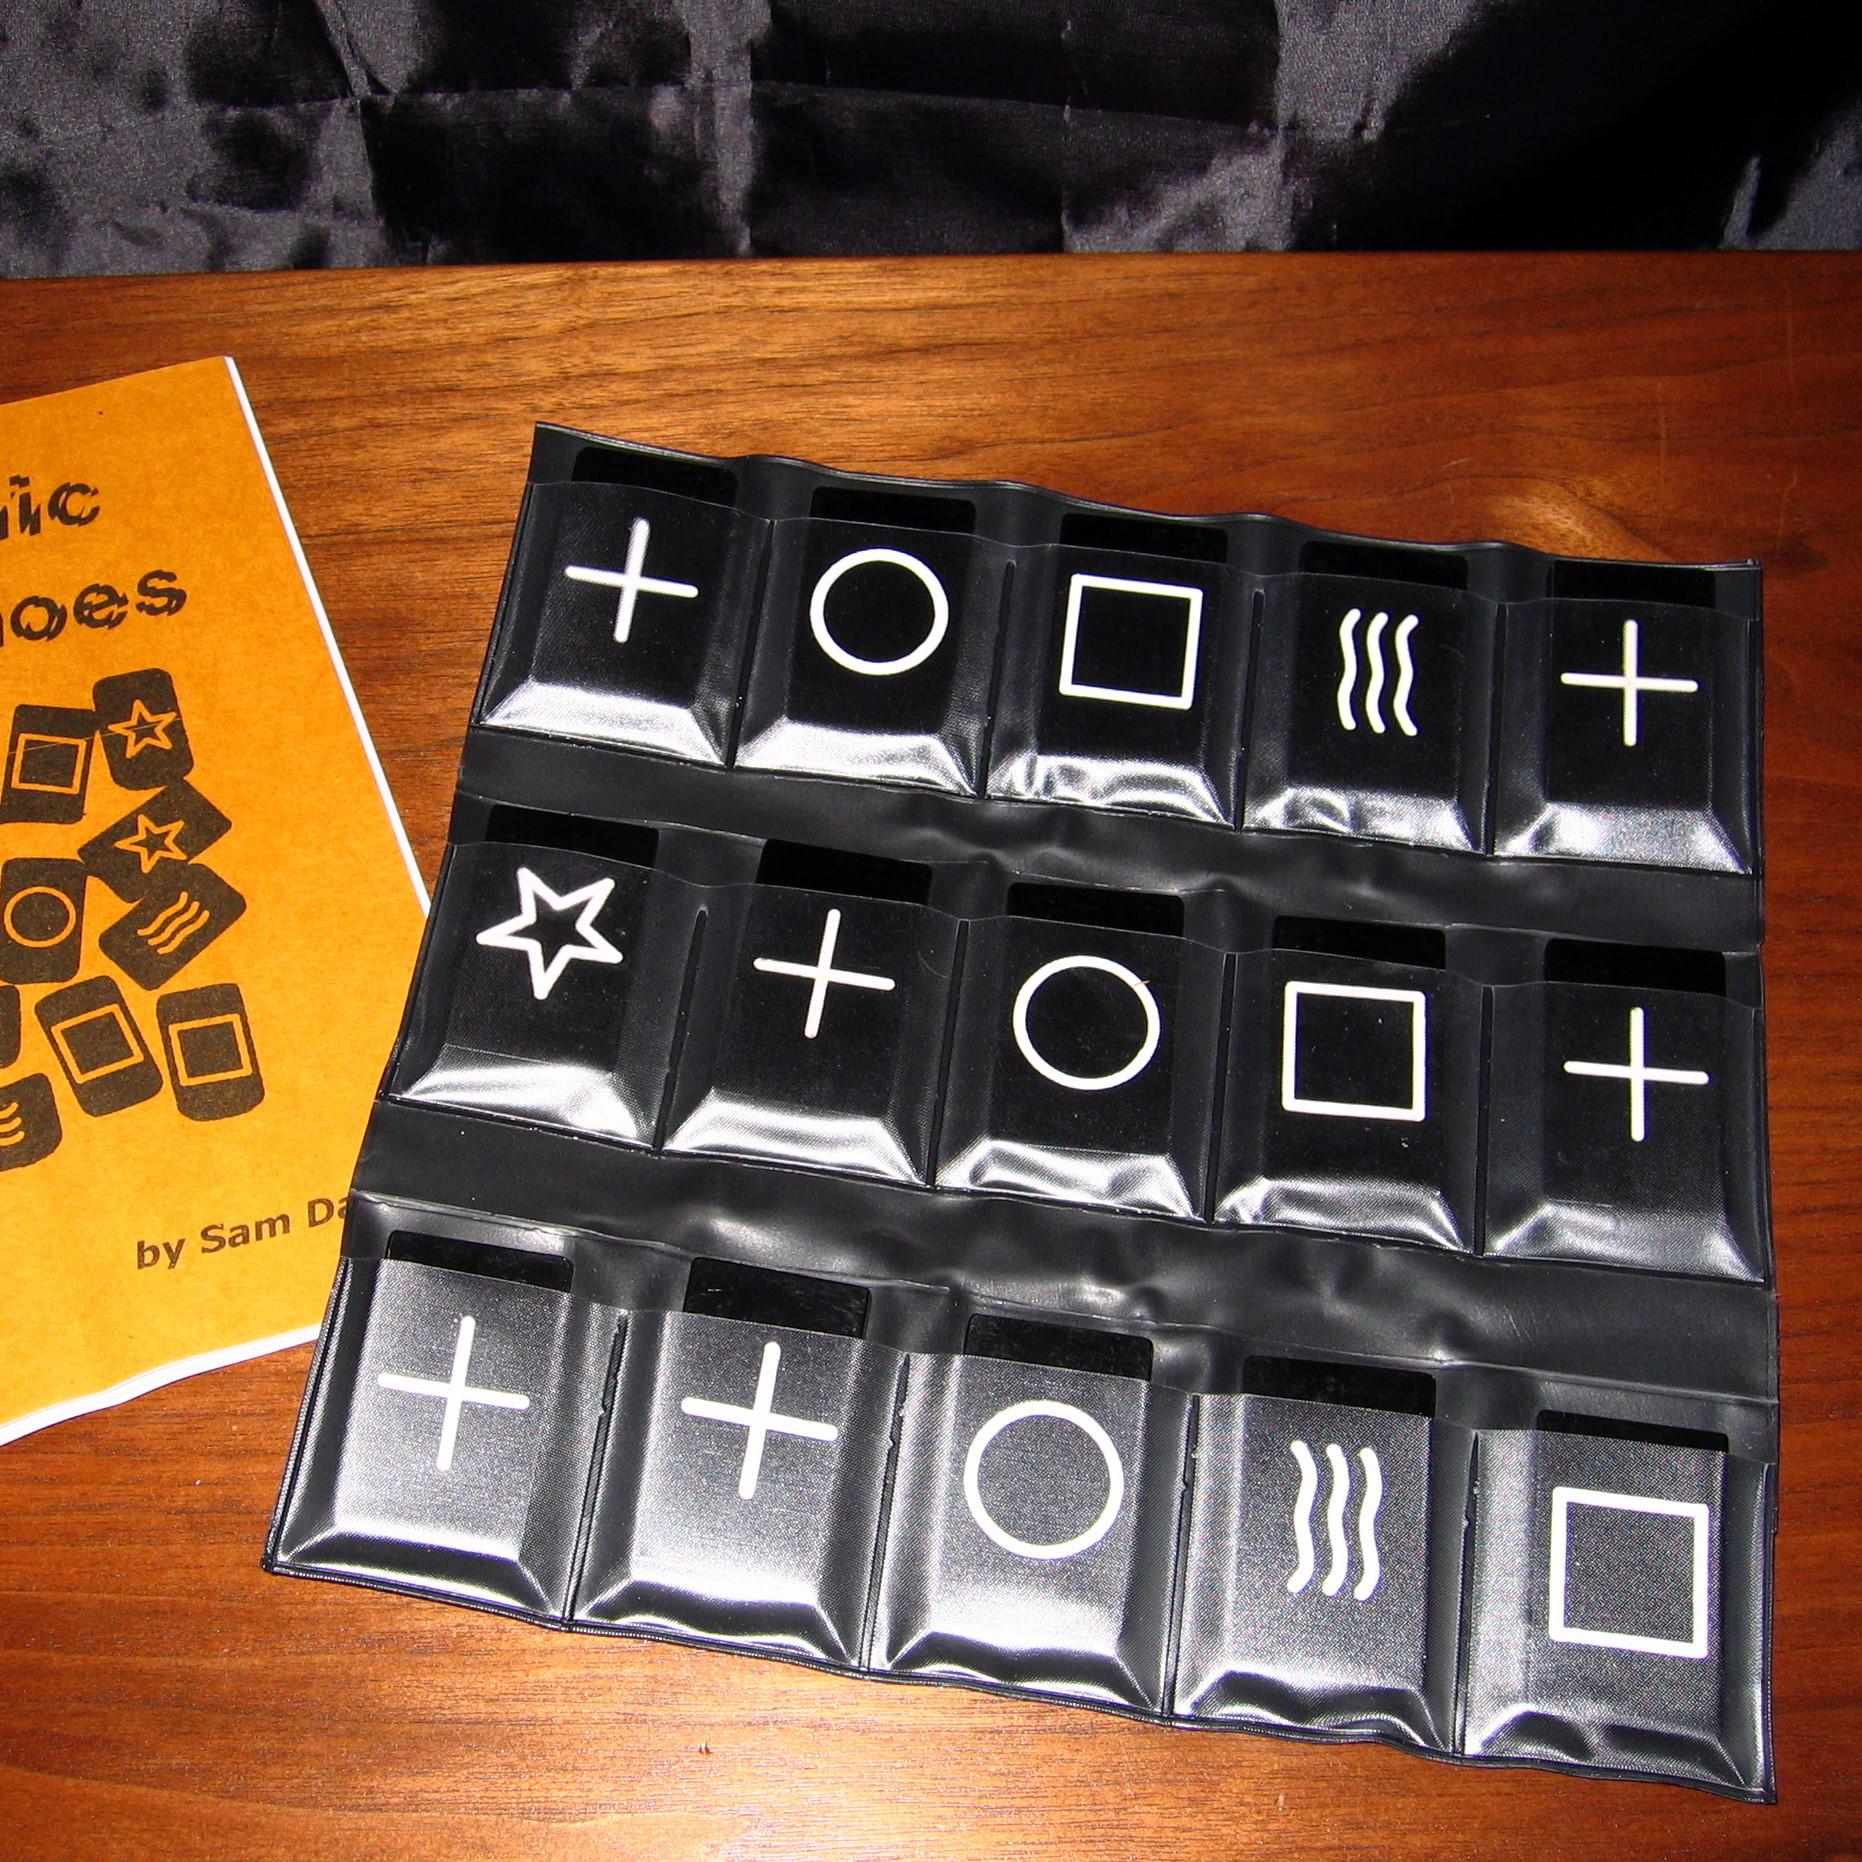 Psychic Dominoes by Sam Dalal